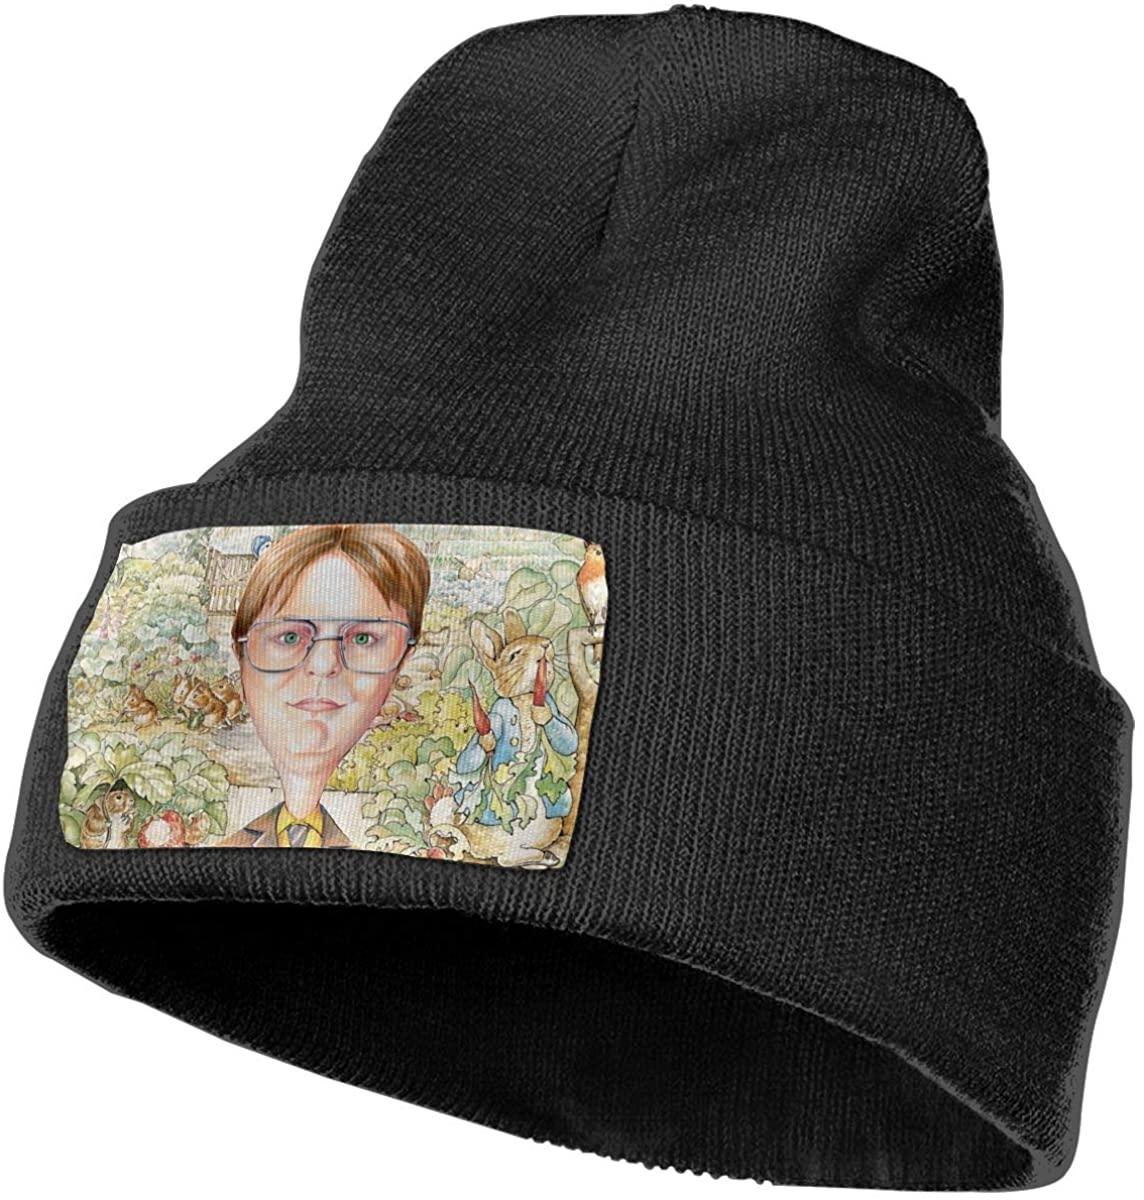 DWI-GHT SCH-ru-te Unisex Fall Winter Warm Knit Cap Beanie Hat Stretchy Ski Cap, 18x30 cm Black